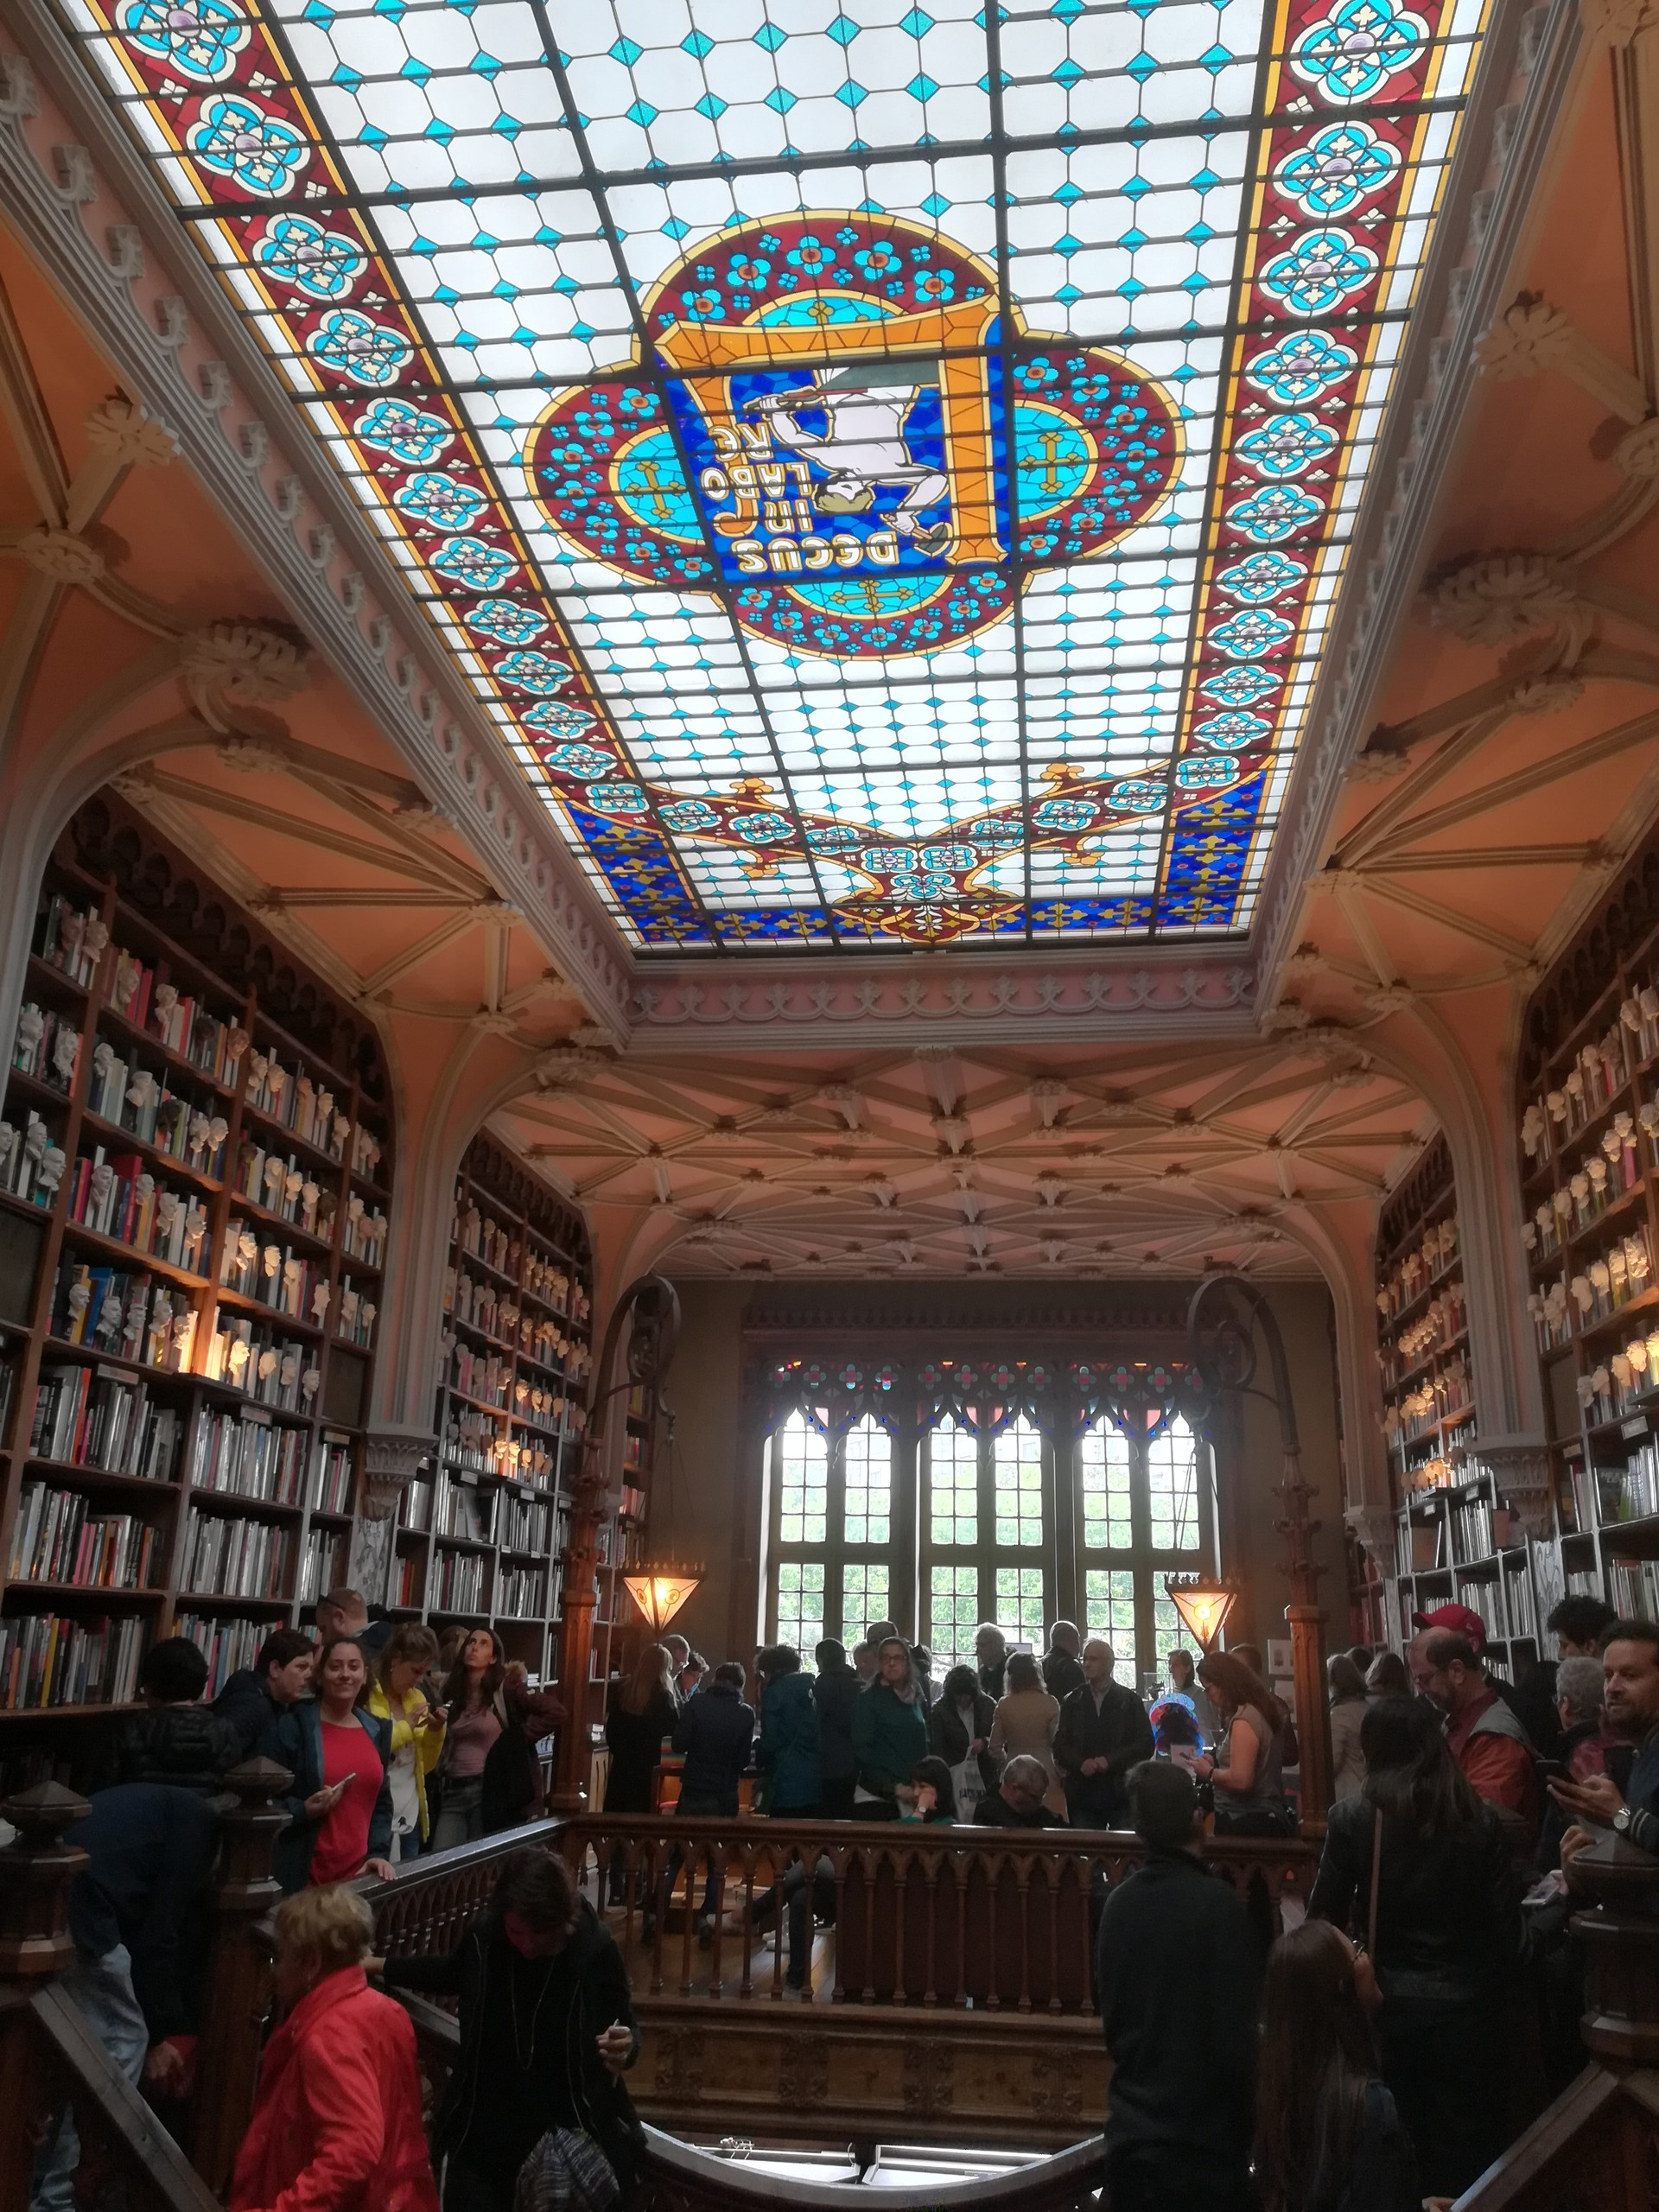 la-librairie-inspire-j-k-rowlings-eefb431319fc9d0a0d894dd01390fc6c.jpg